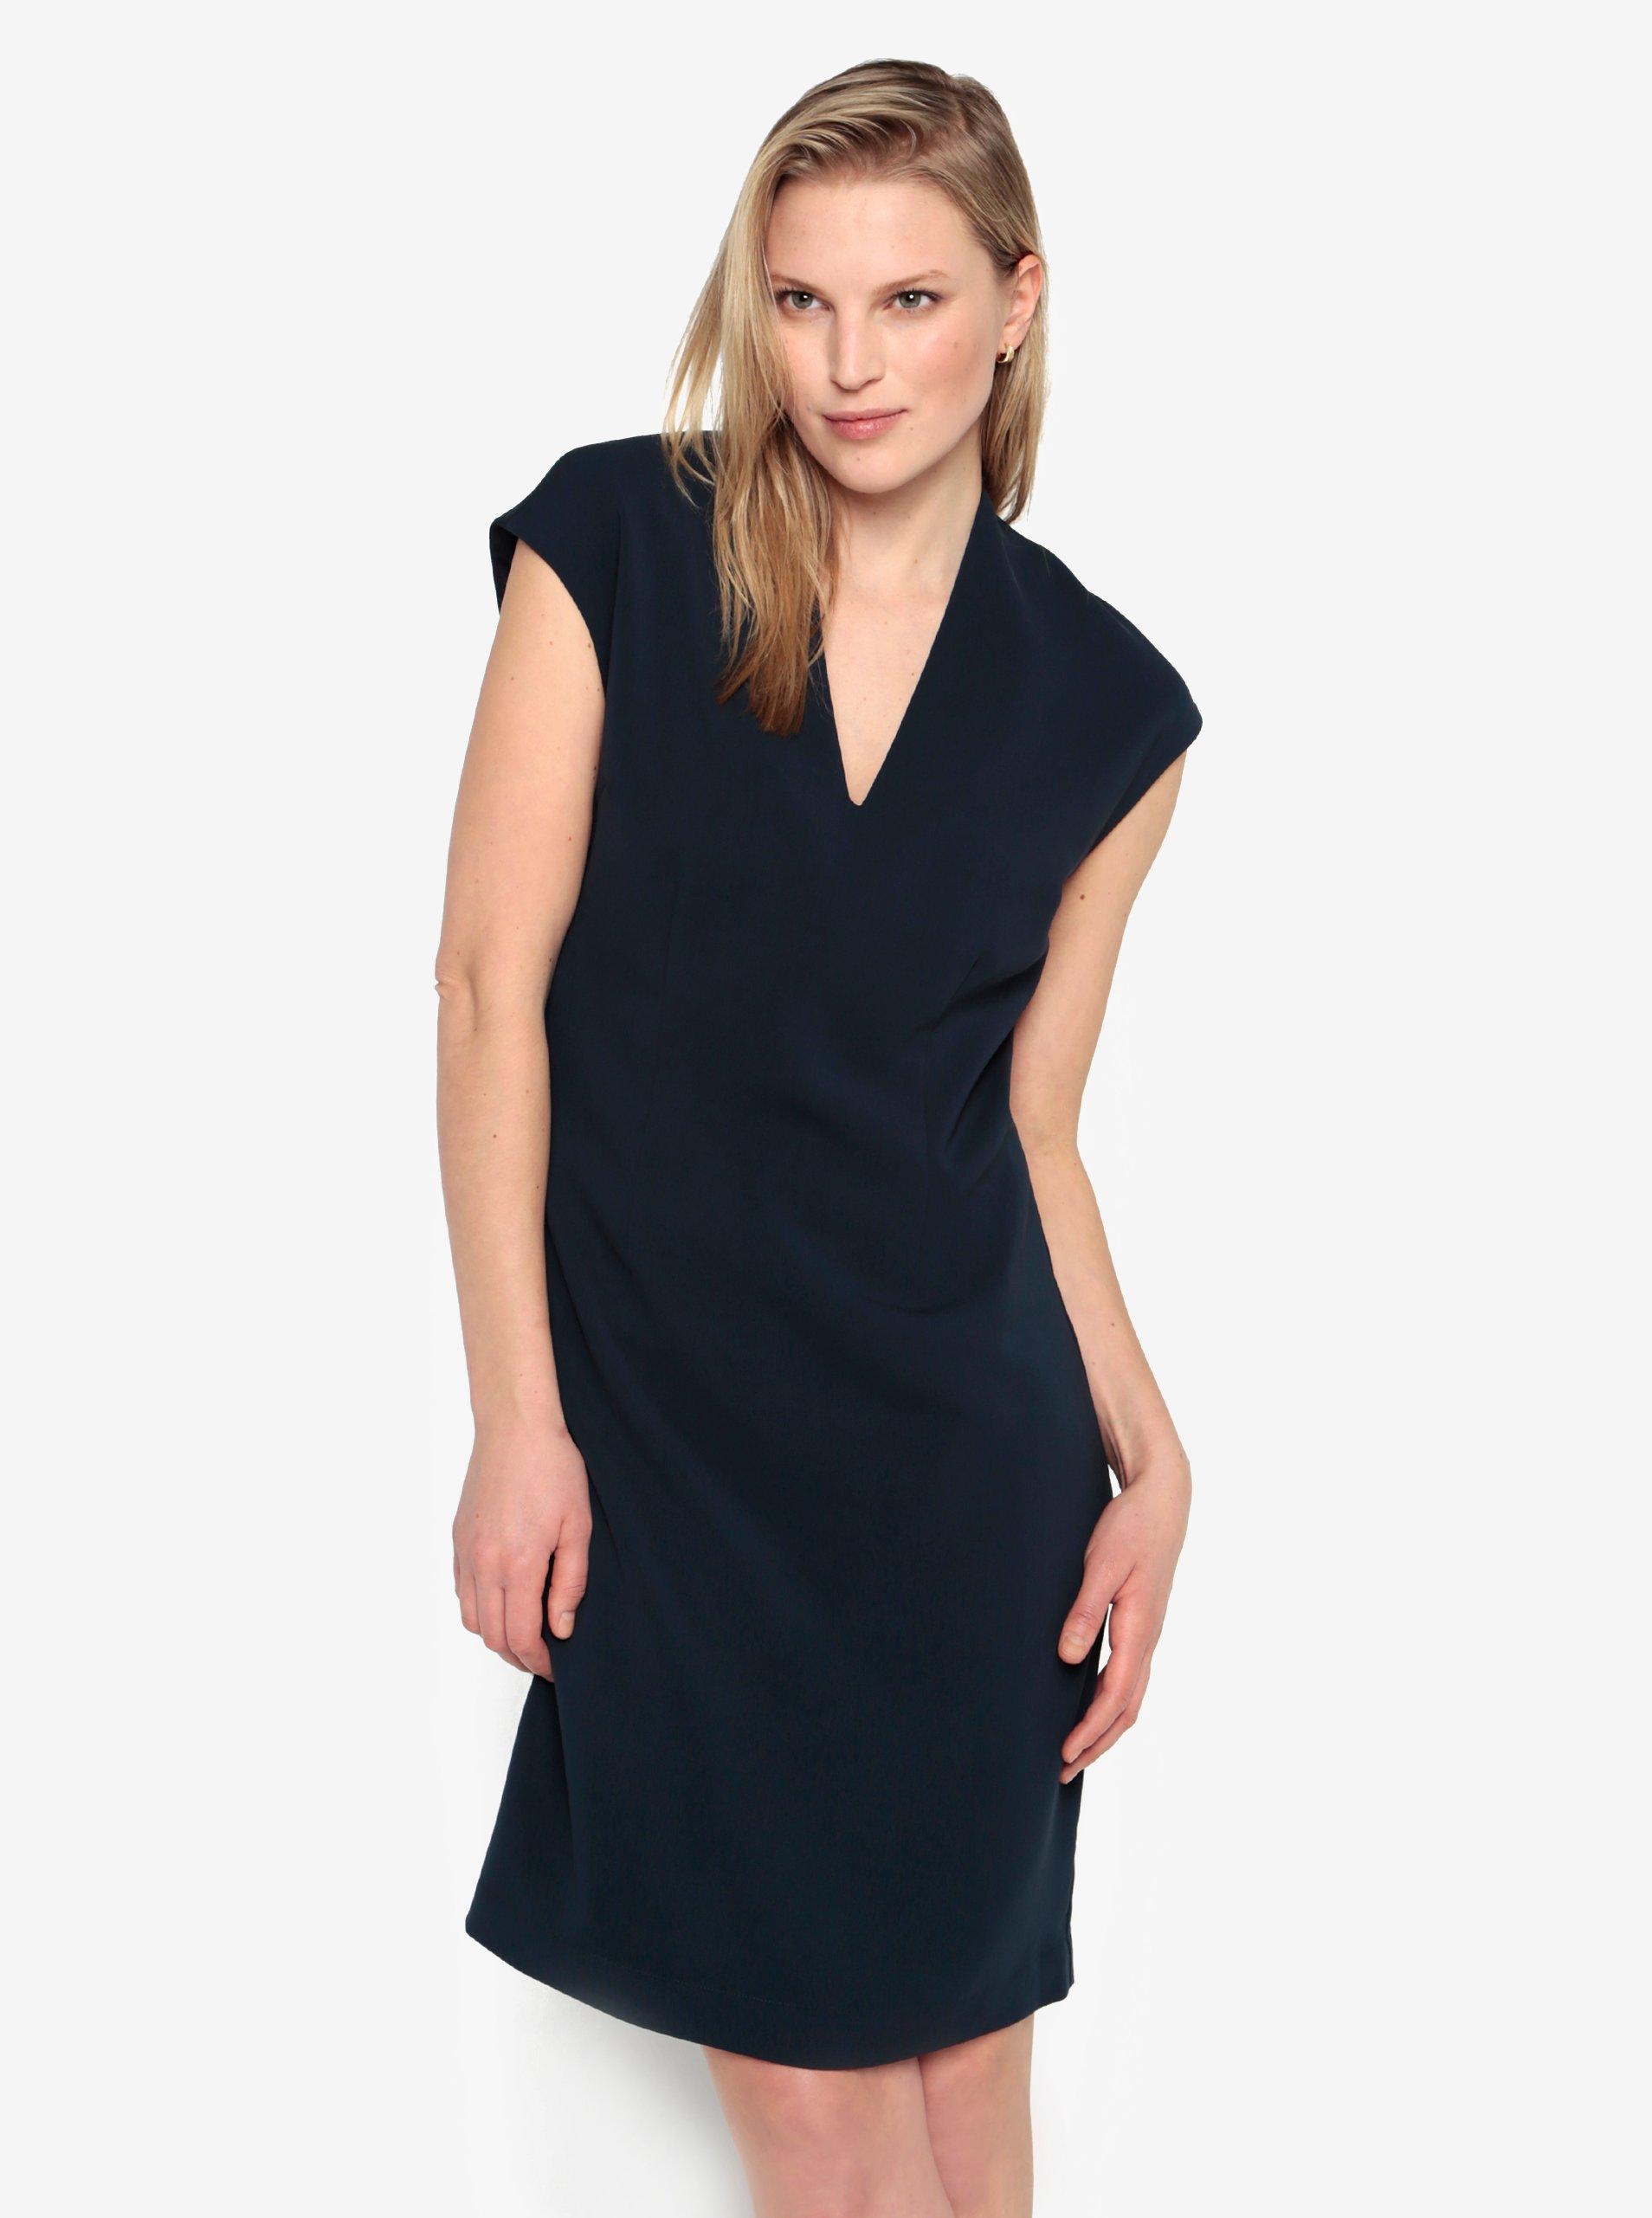 107c7d37fc Tmavomodré šaty s véčkovým výstrihom Selected Femme Ninna